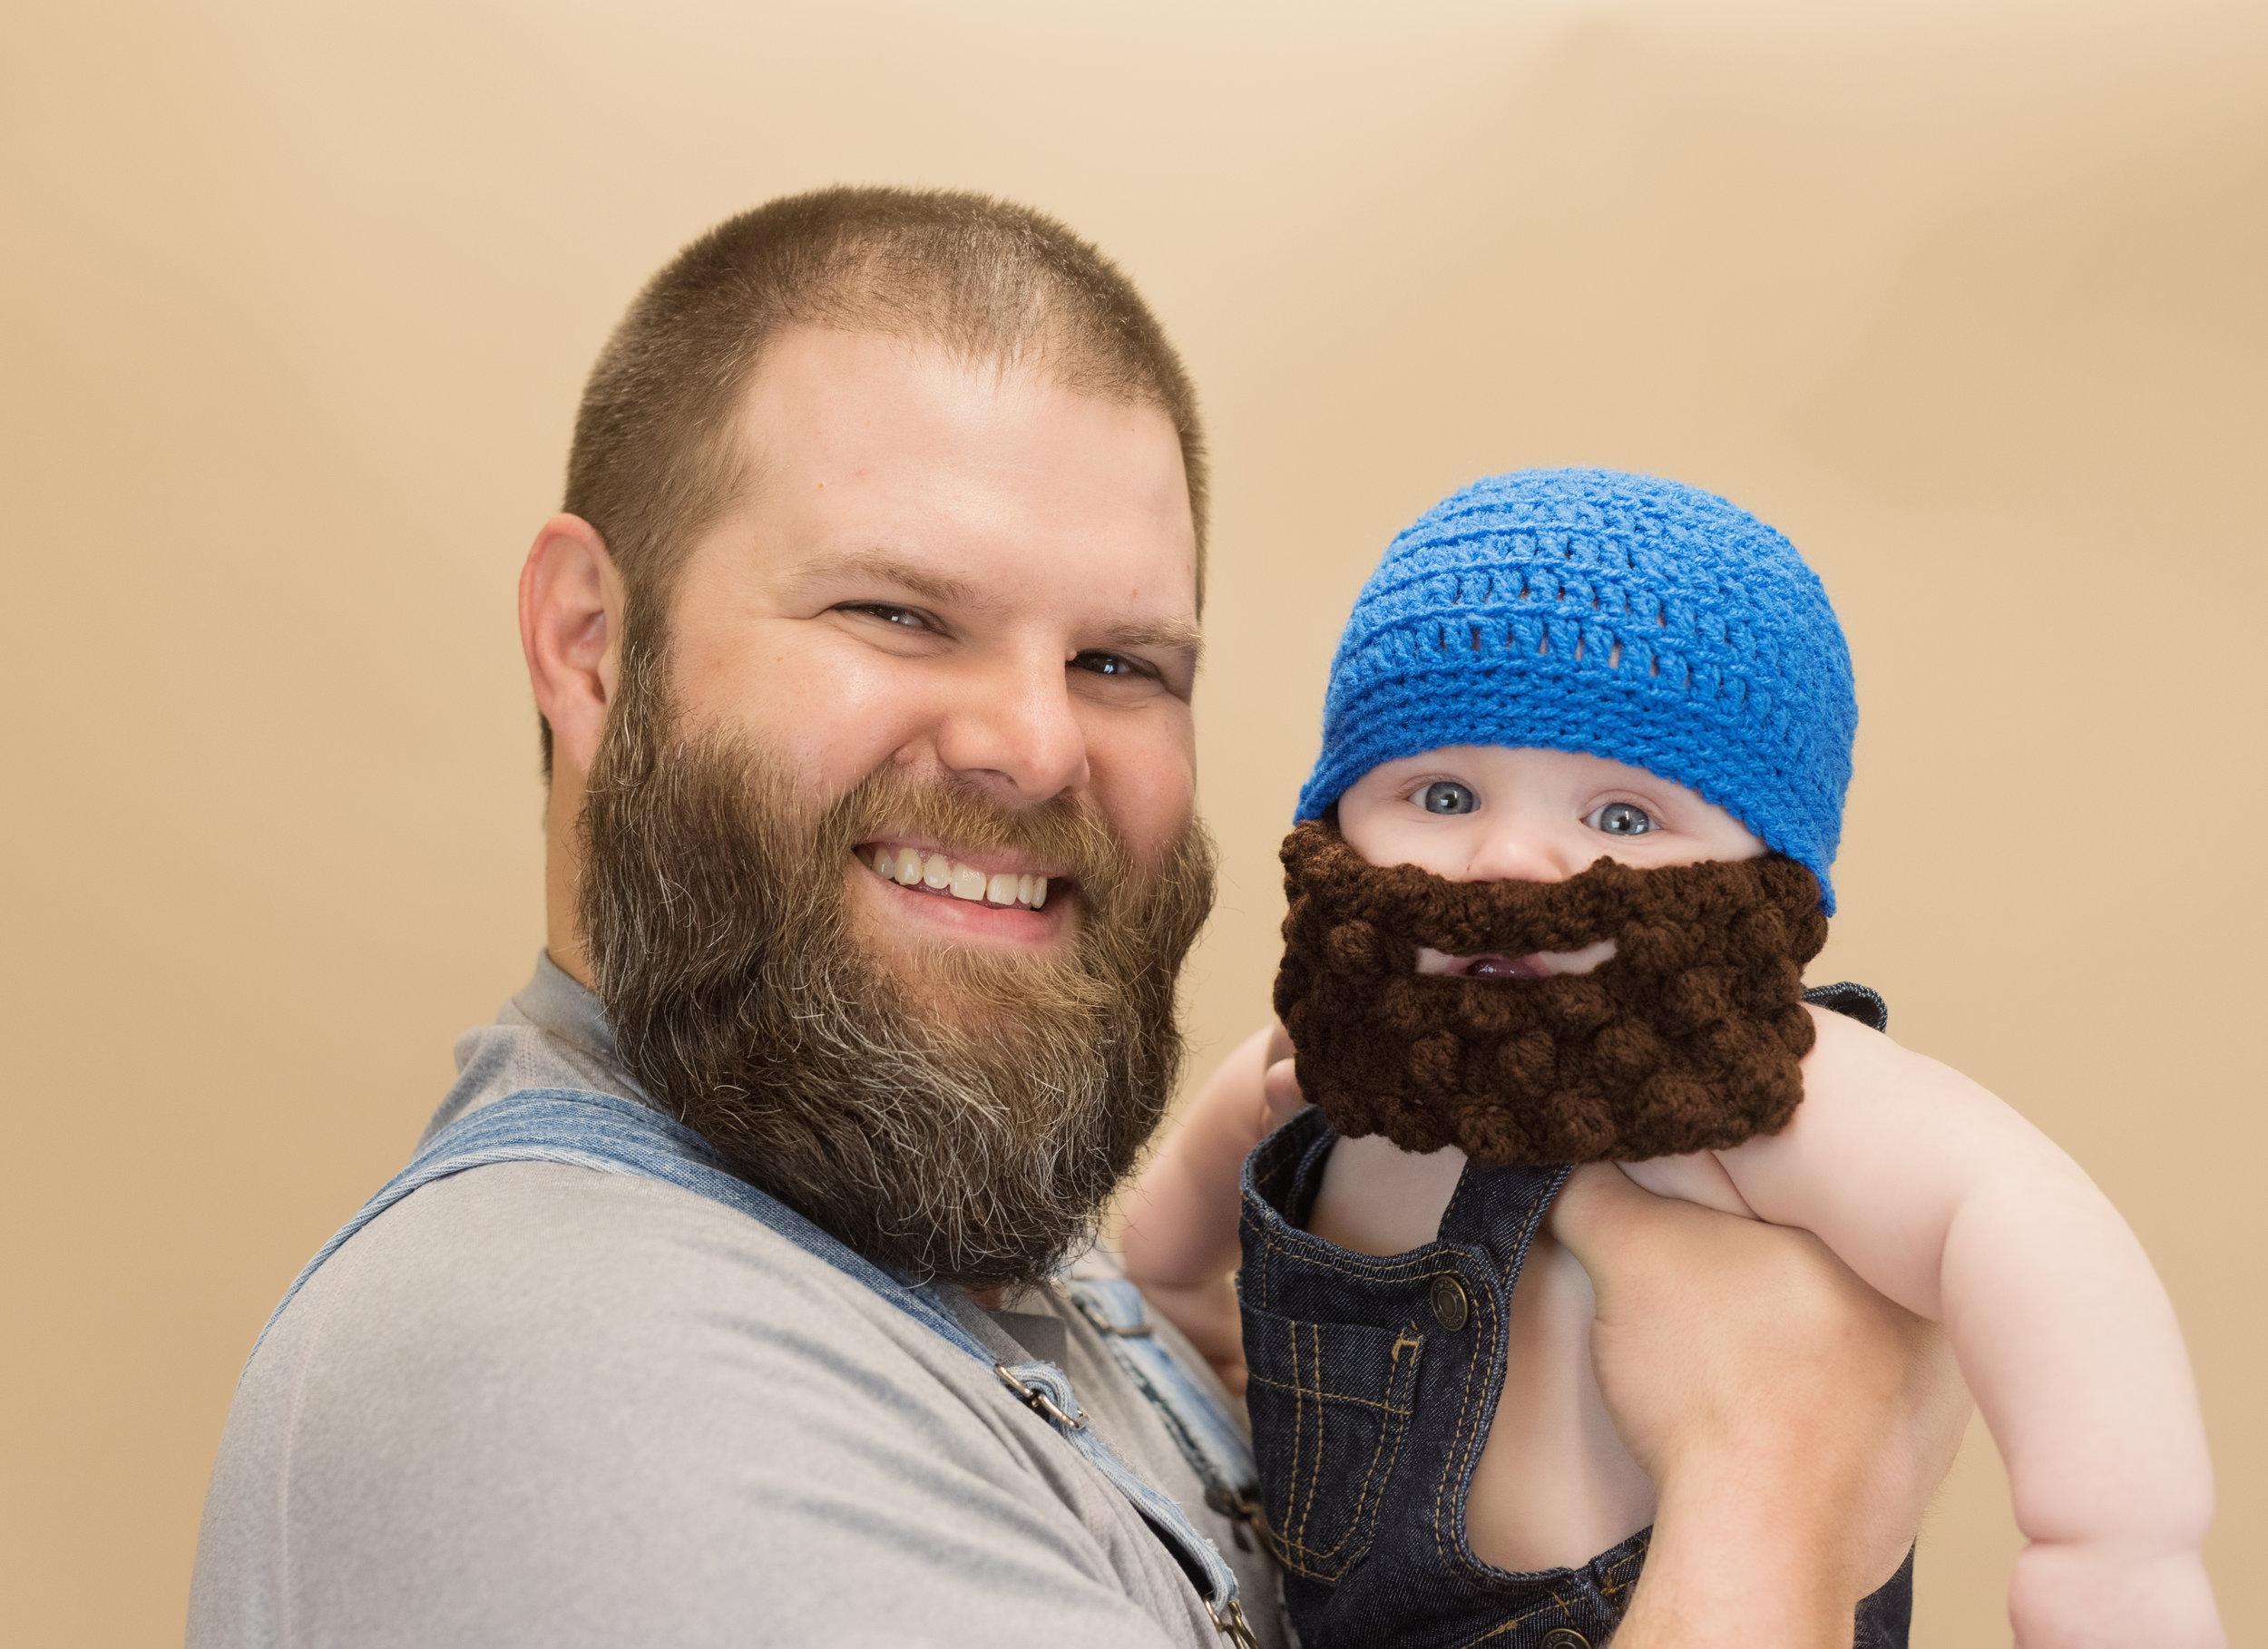 silly daddy and son photos ideas